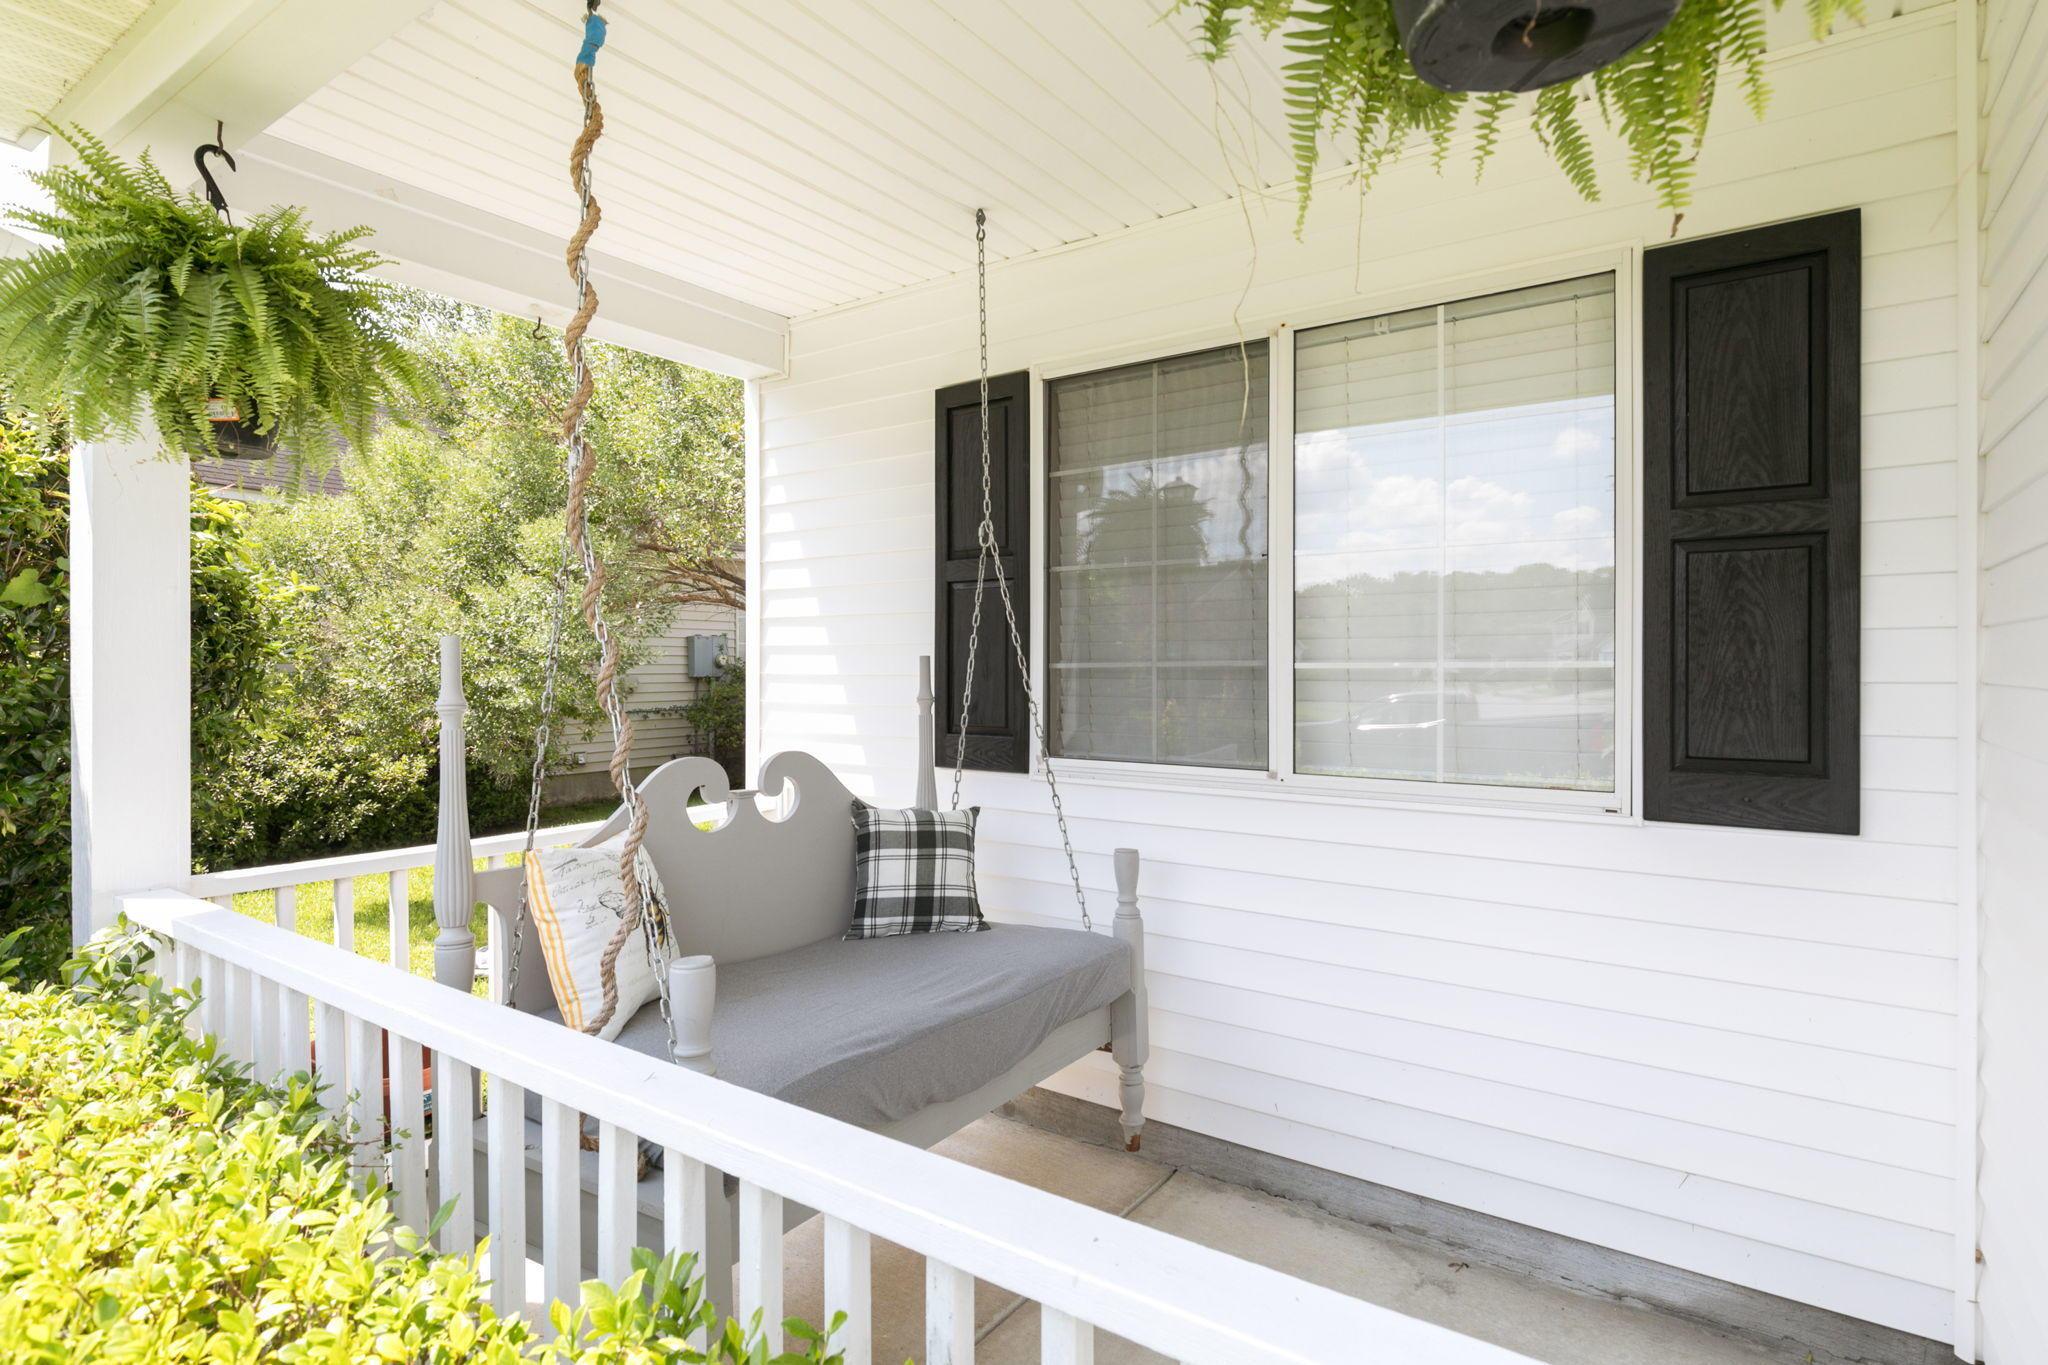 Bridges of Summerville Homes For Sale - 25 Regency Oaks, Summerville, SC - 25